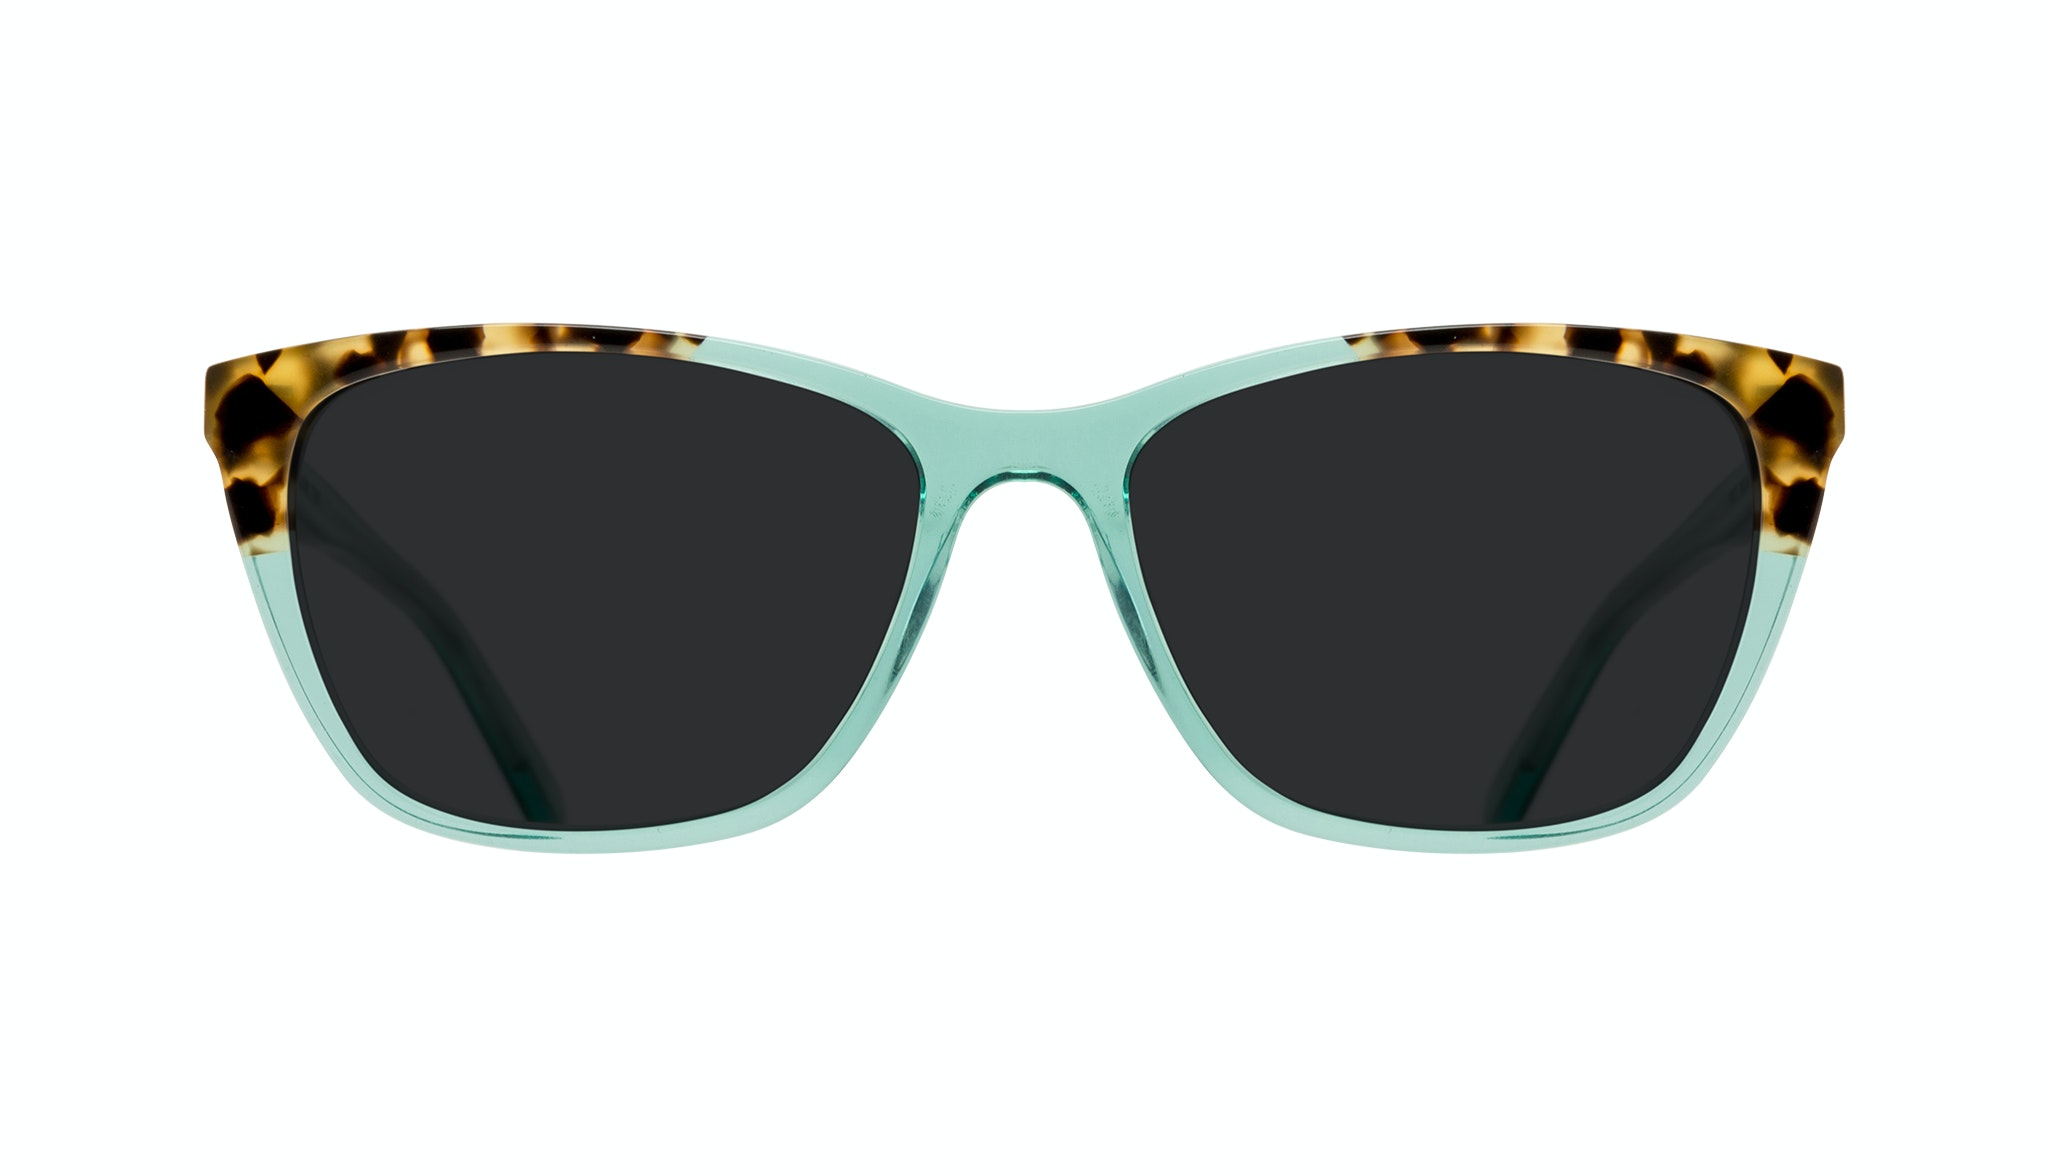 Affordable Fashion Glasses Cat Eye Rectangle Sunglasses Women Myrtle Emeraude Tort